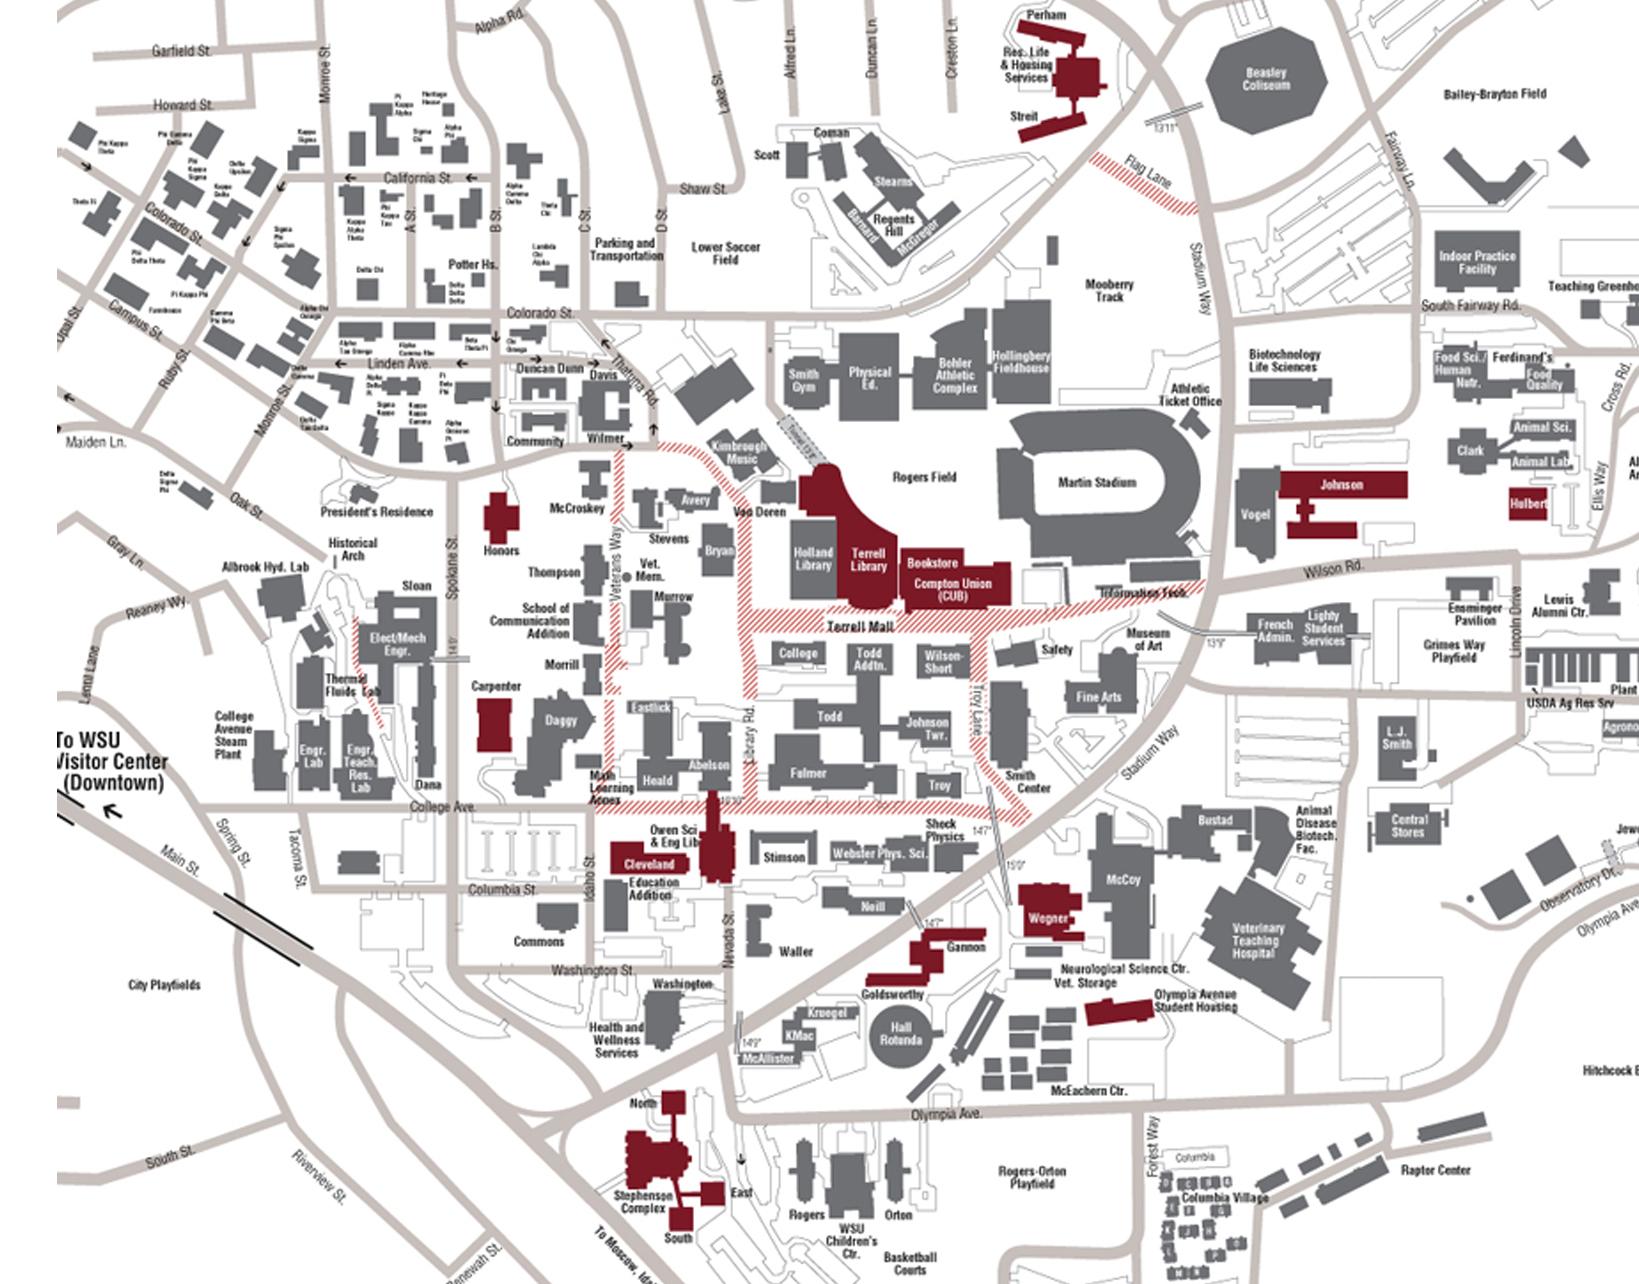 Wsu Campus Map Wsu Map Japan Map For Tourist detroit airport terminal map Wsu Campus Map